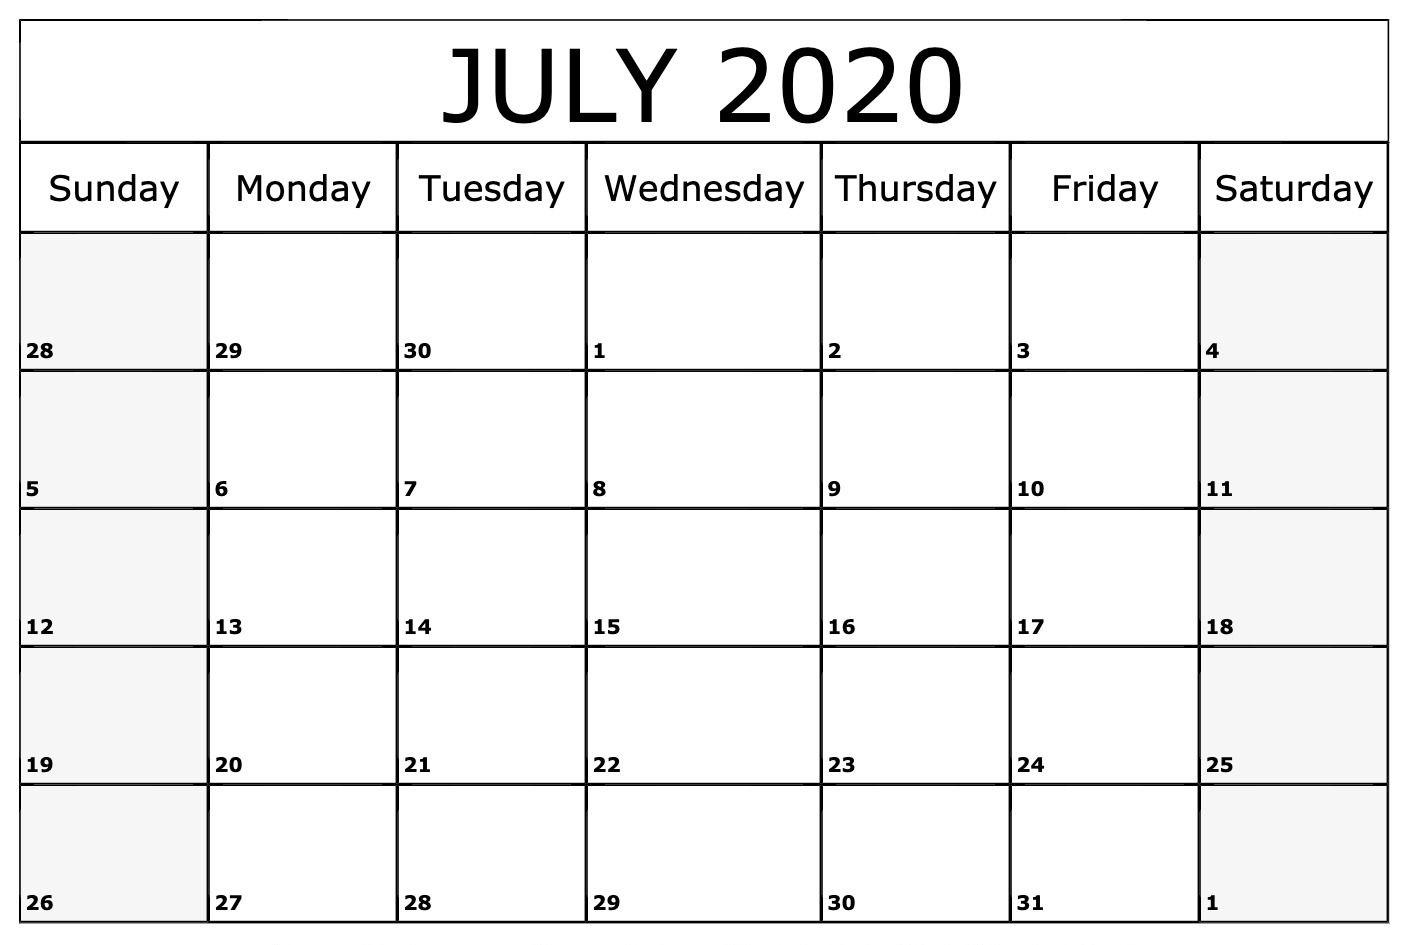 Free July 2020 Printable Calendar July July2020 July2020calendar 2020calendars Julycale July Calendar Monthly Calendar Template Monthly Calendar Printable